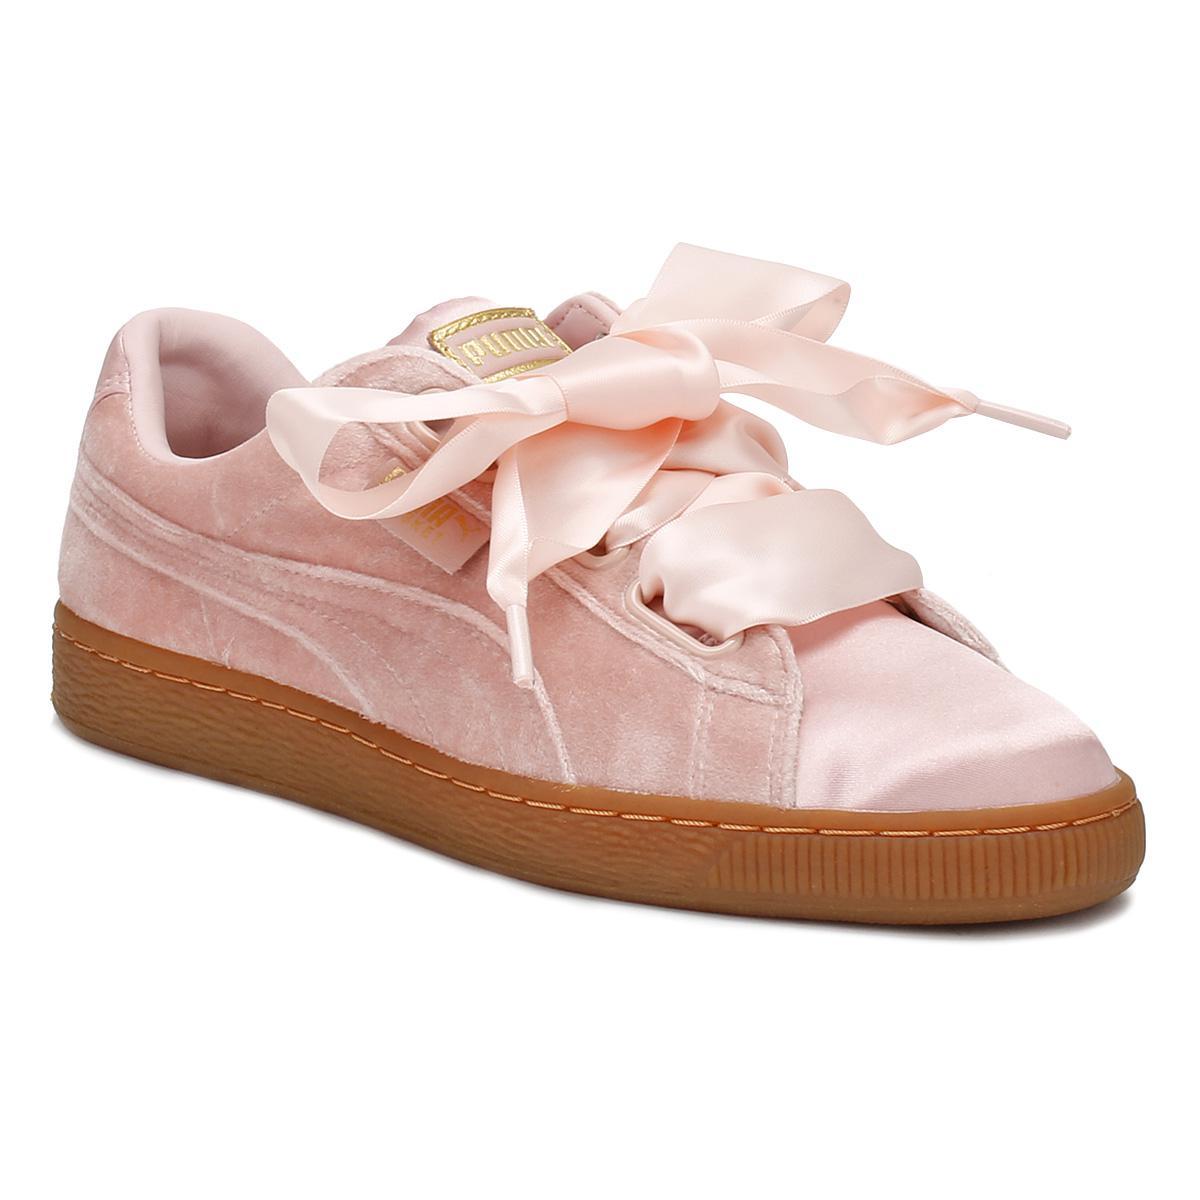 ff0f418679f Lyst - PUMA Womens Pink   Gum Velvet Basket Heart Trainers Women s ...